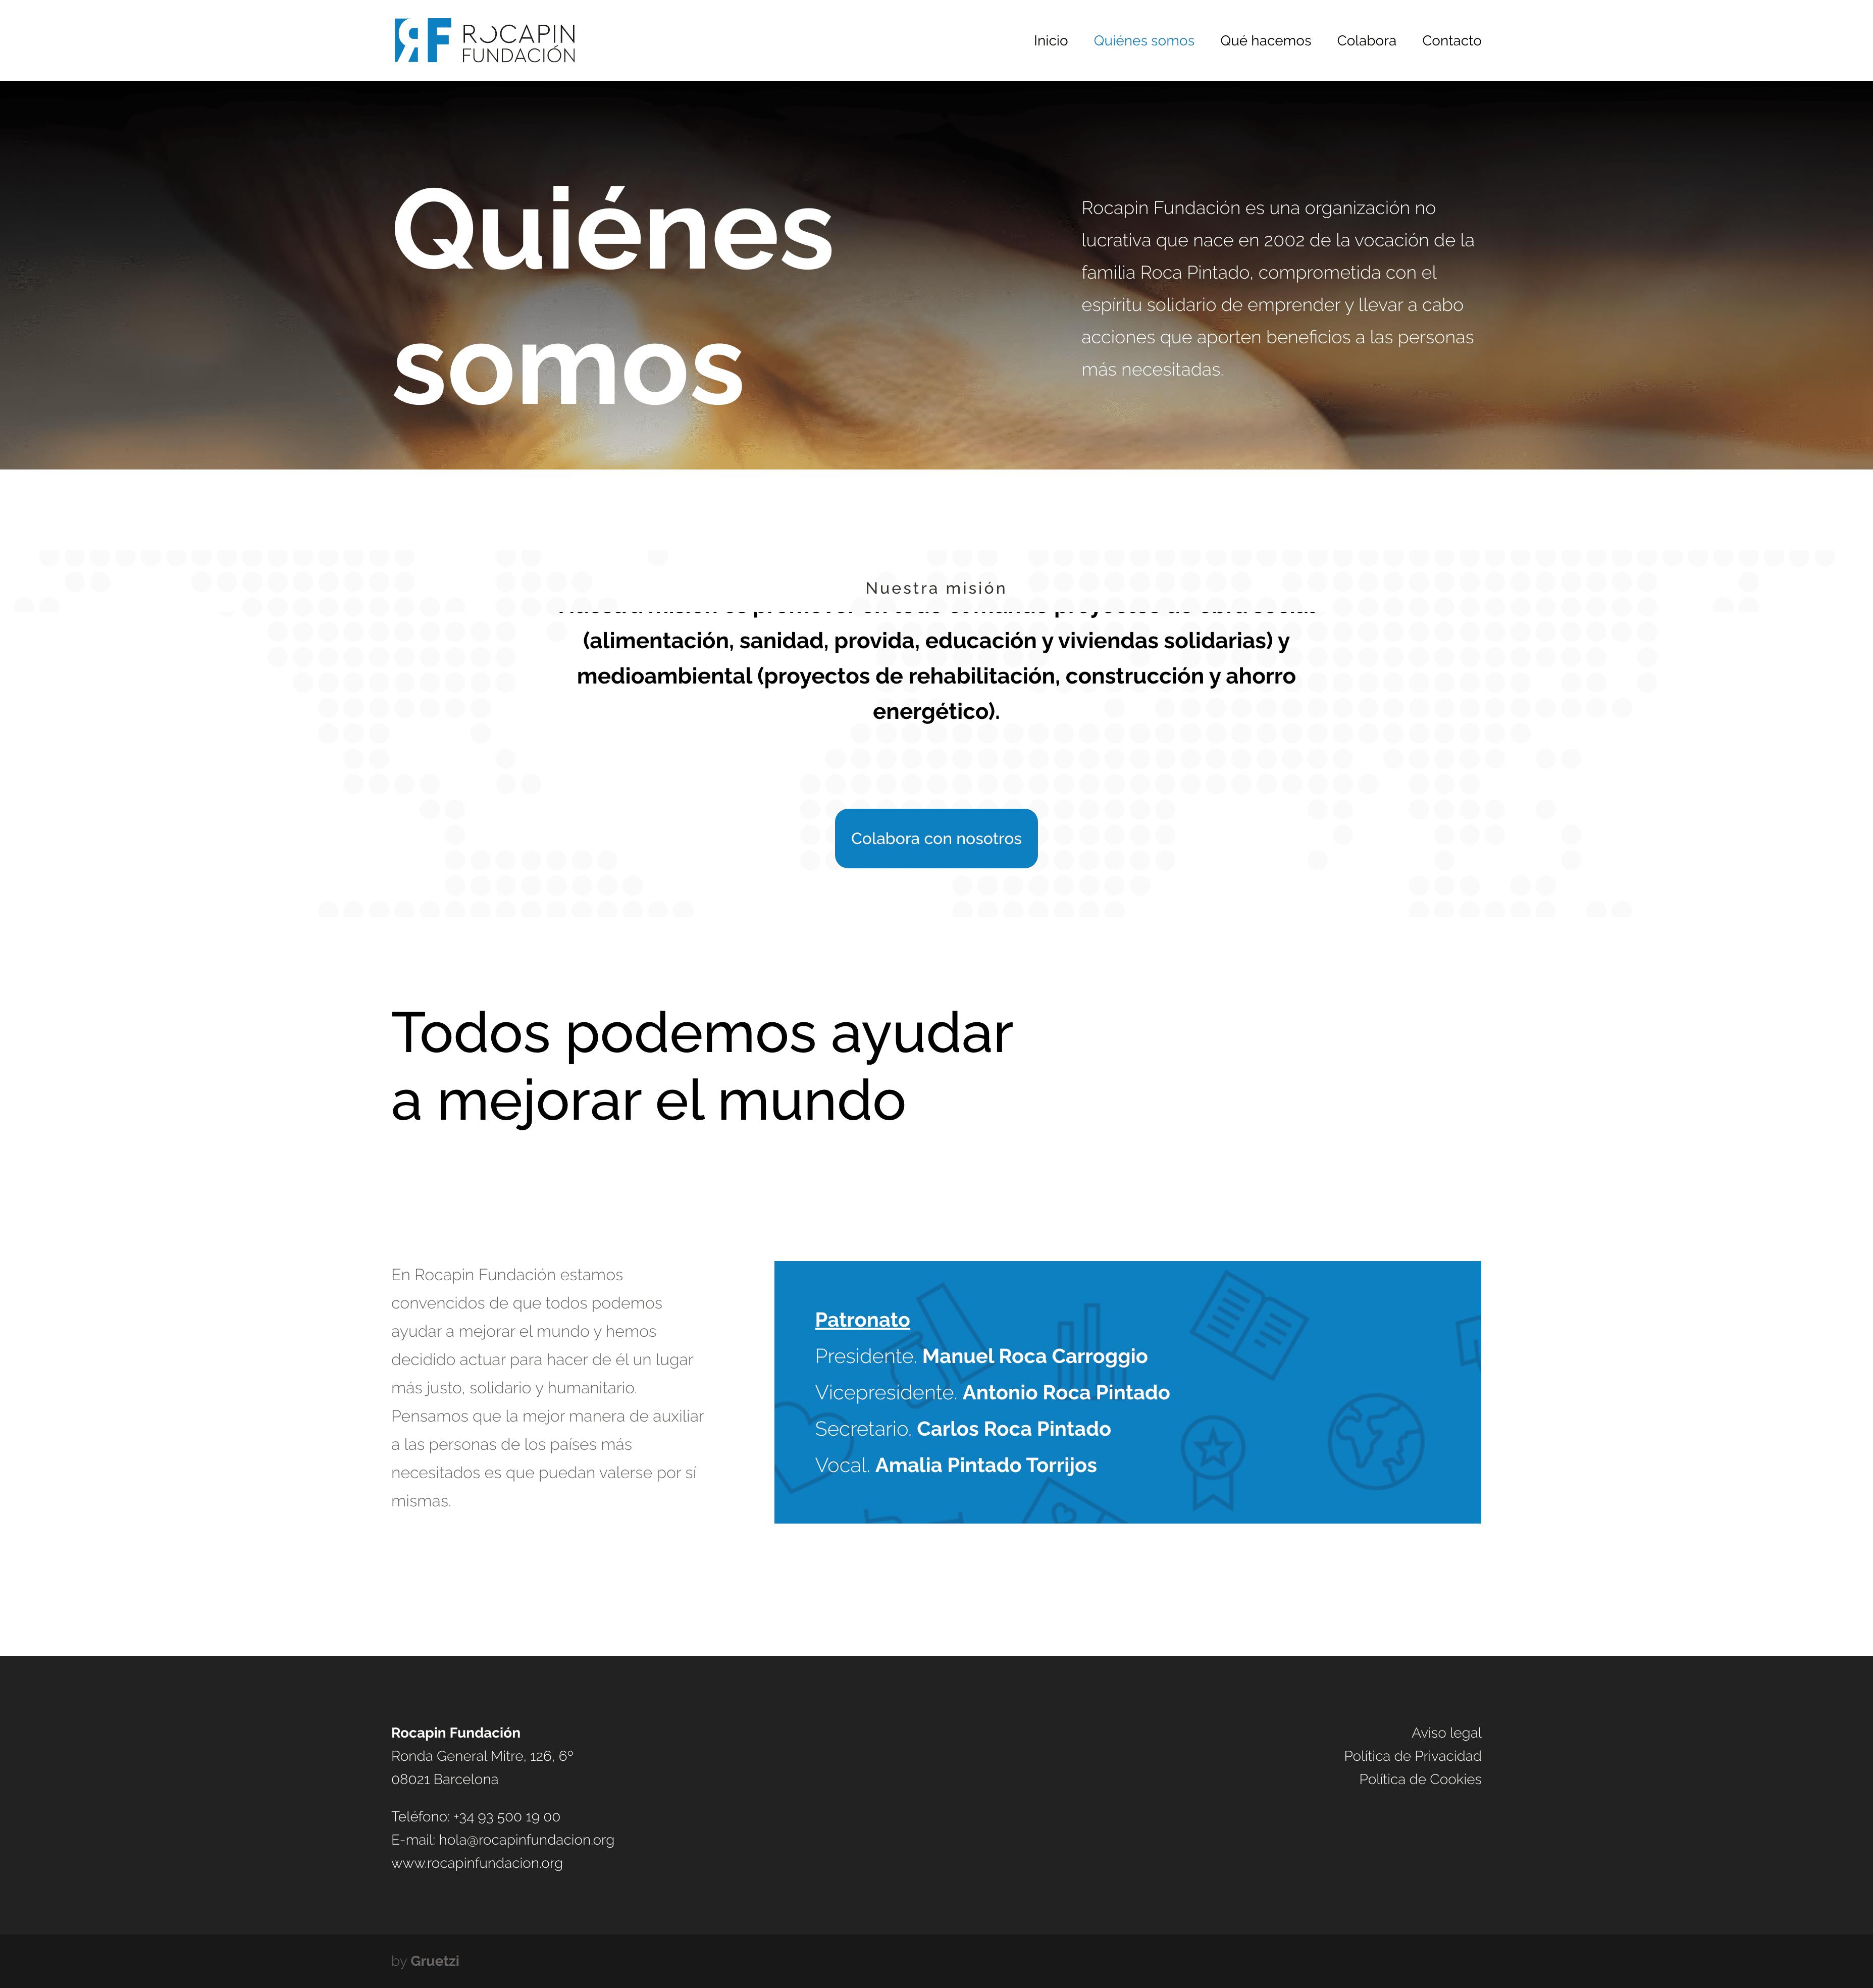 dissenyadors-web-barcelona-rocapin-fundacion-gruetzi